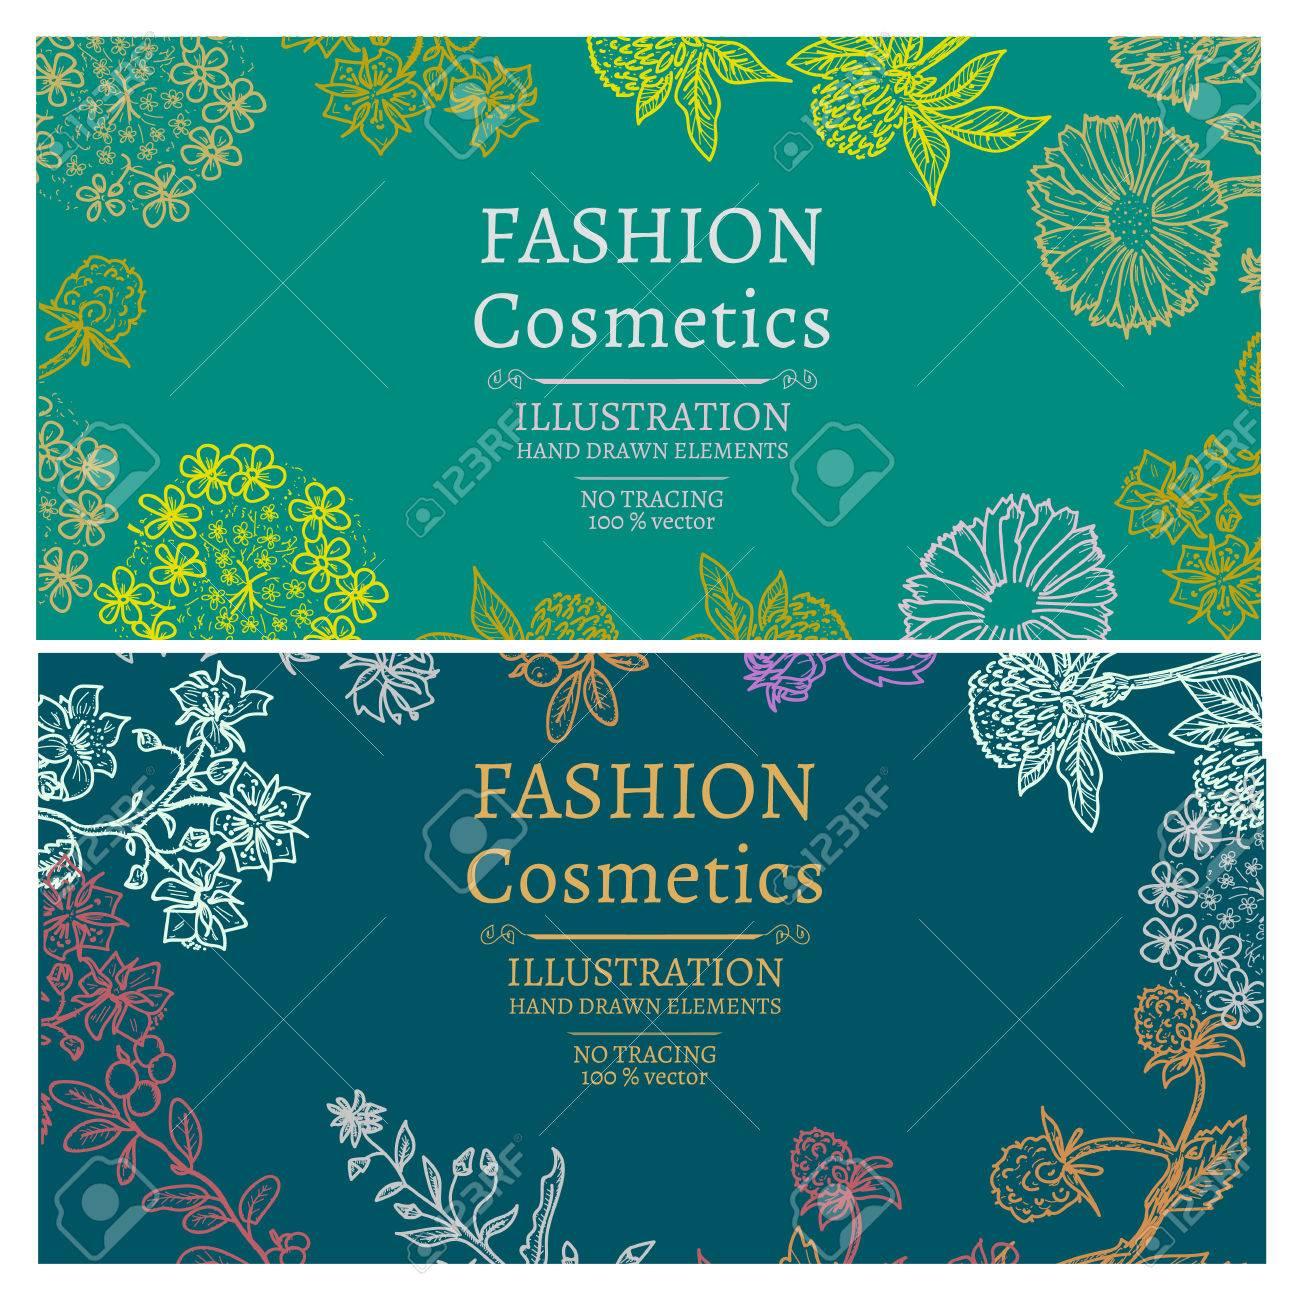 Fashion cosmetics banners hand drawn vintage sketch vector illustration - 54301970